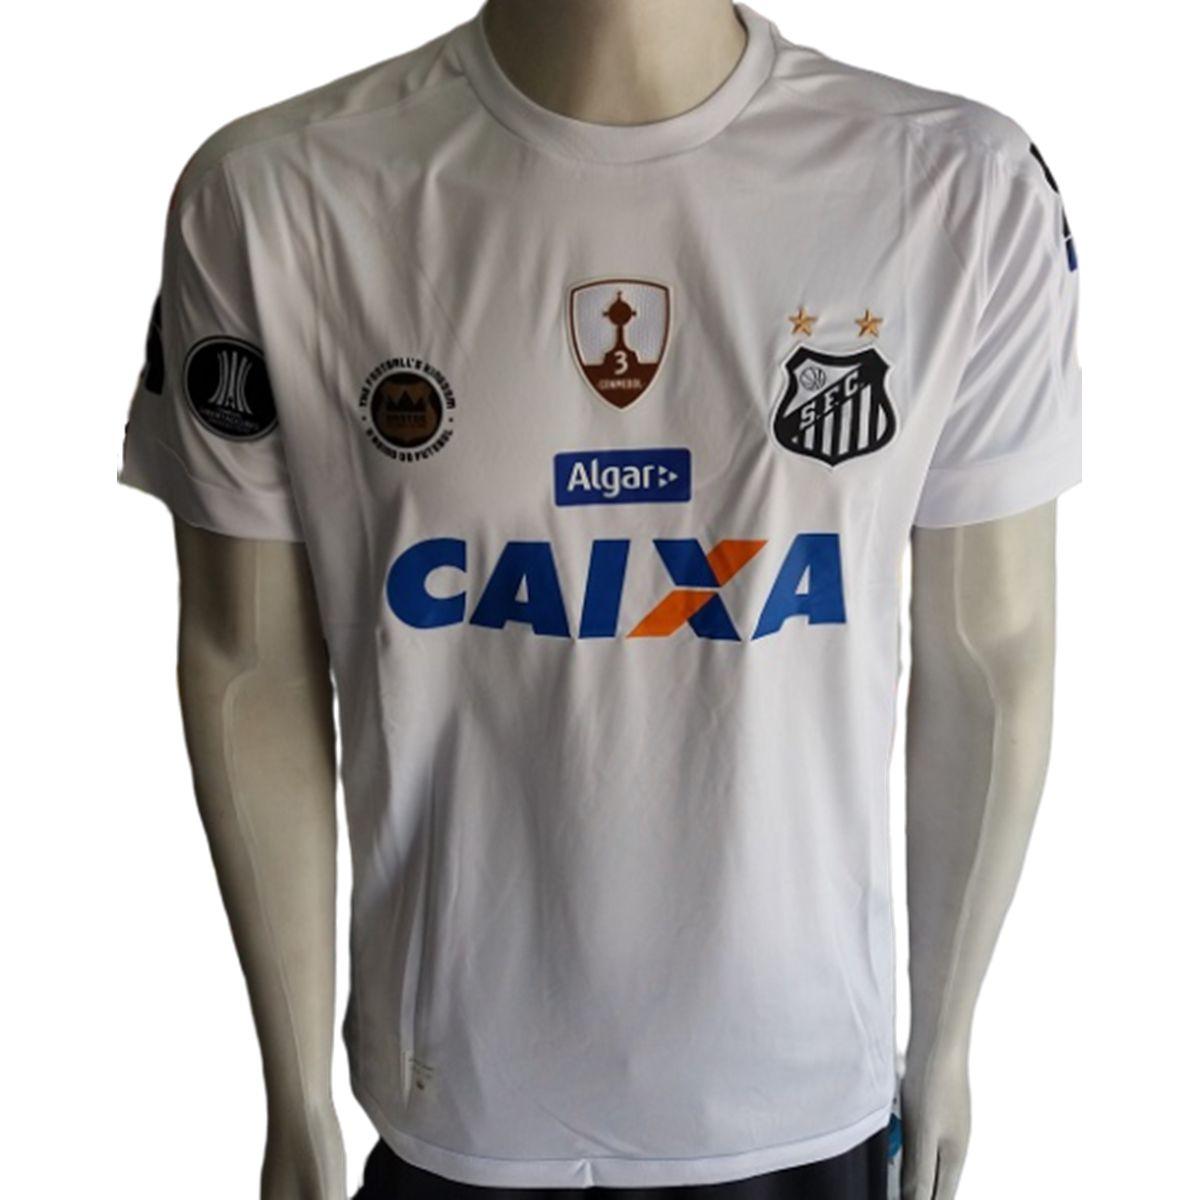 Camisa Santos 1 2017/2018 Libertadores S/Nº com Patch Commebol Authentic